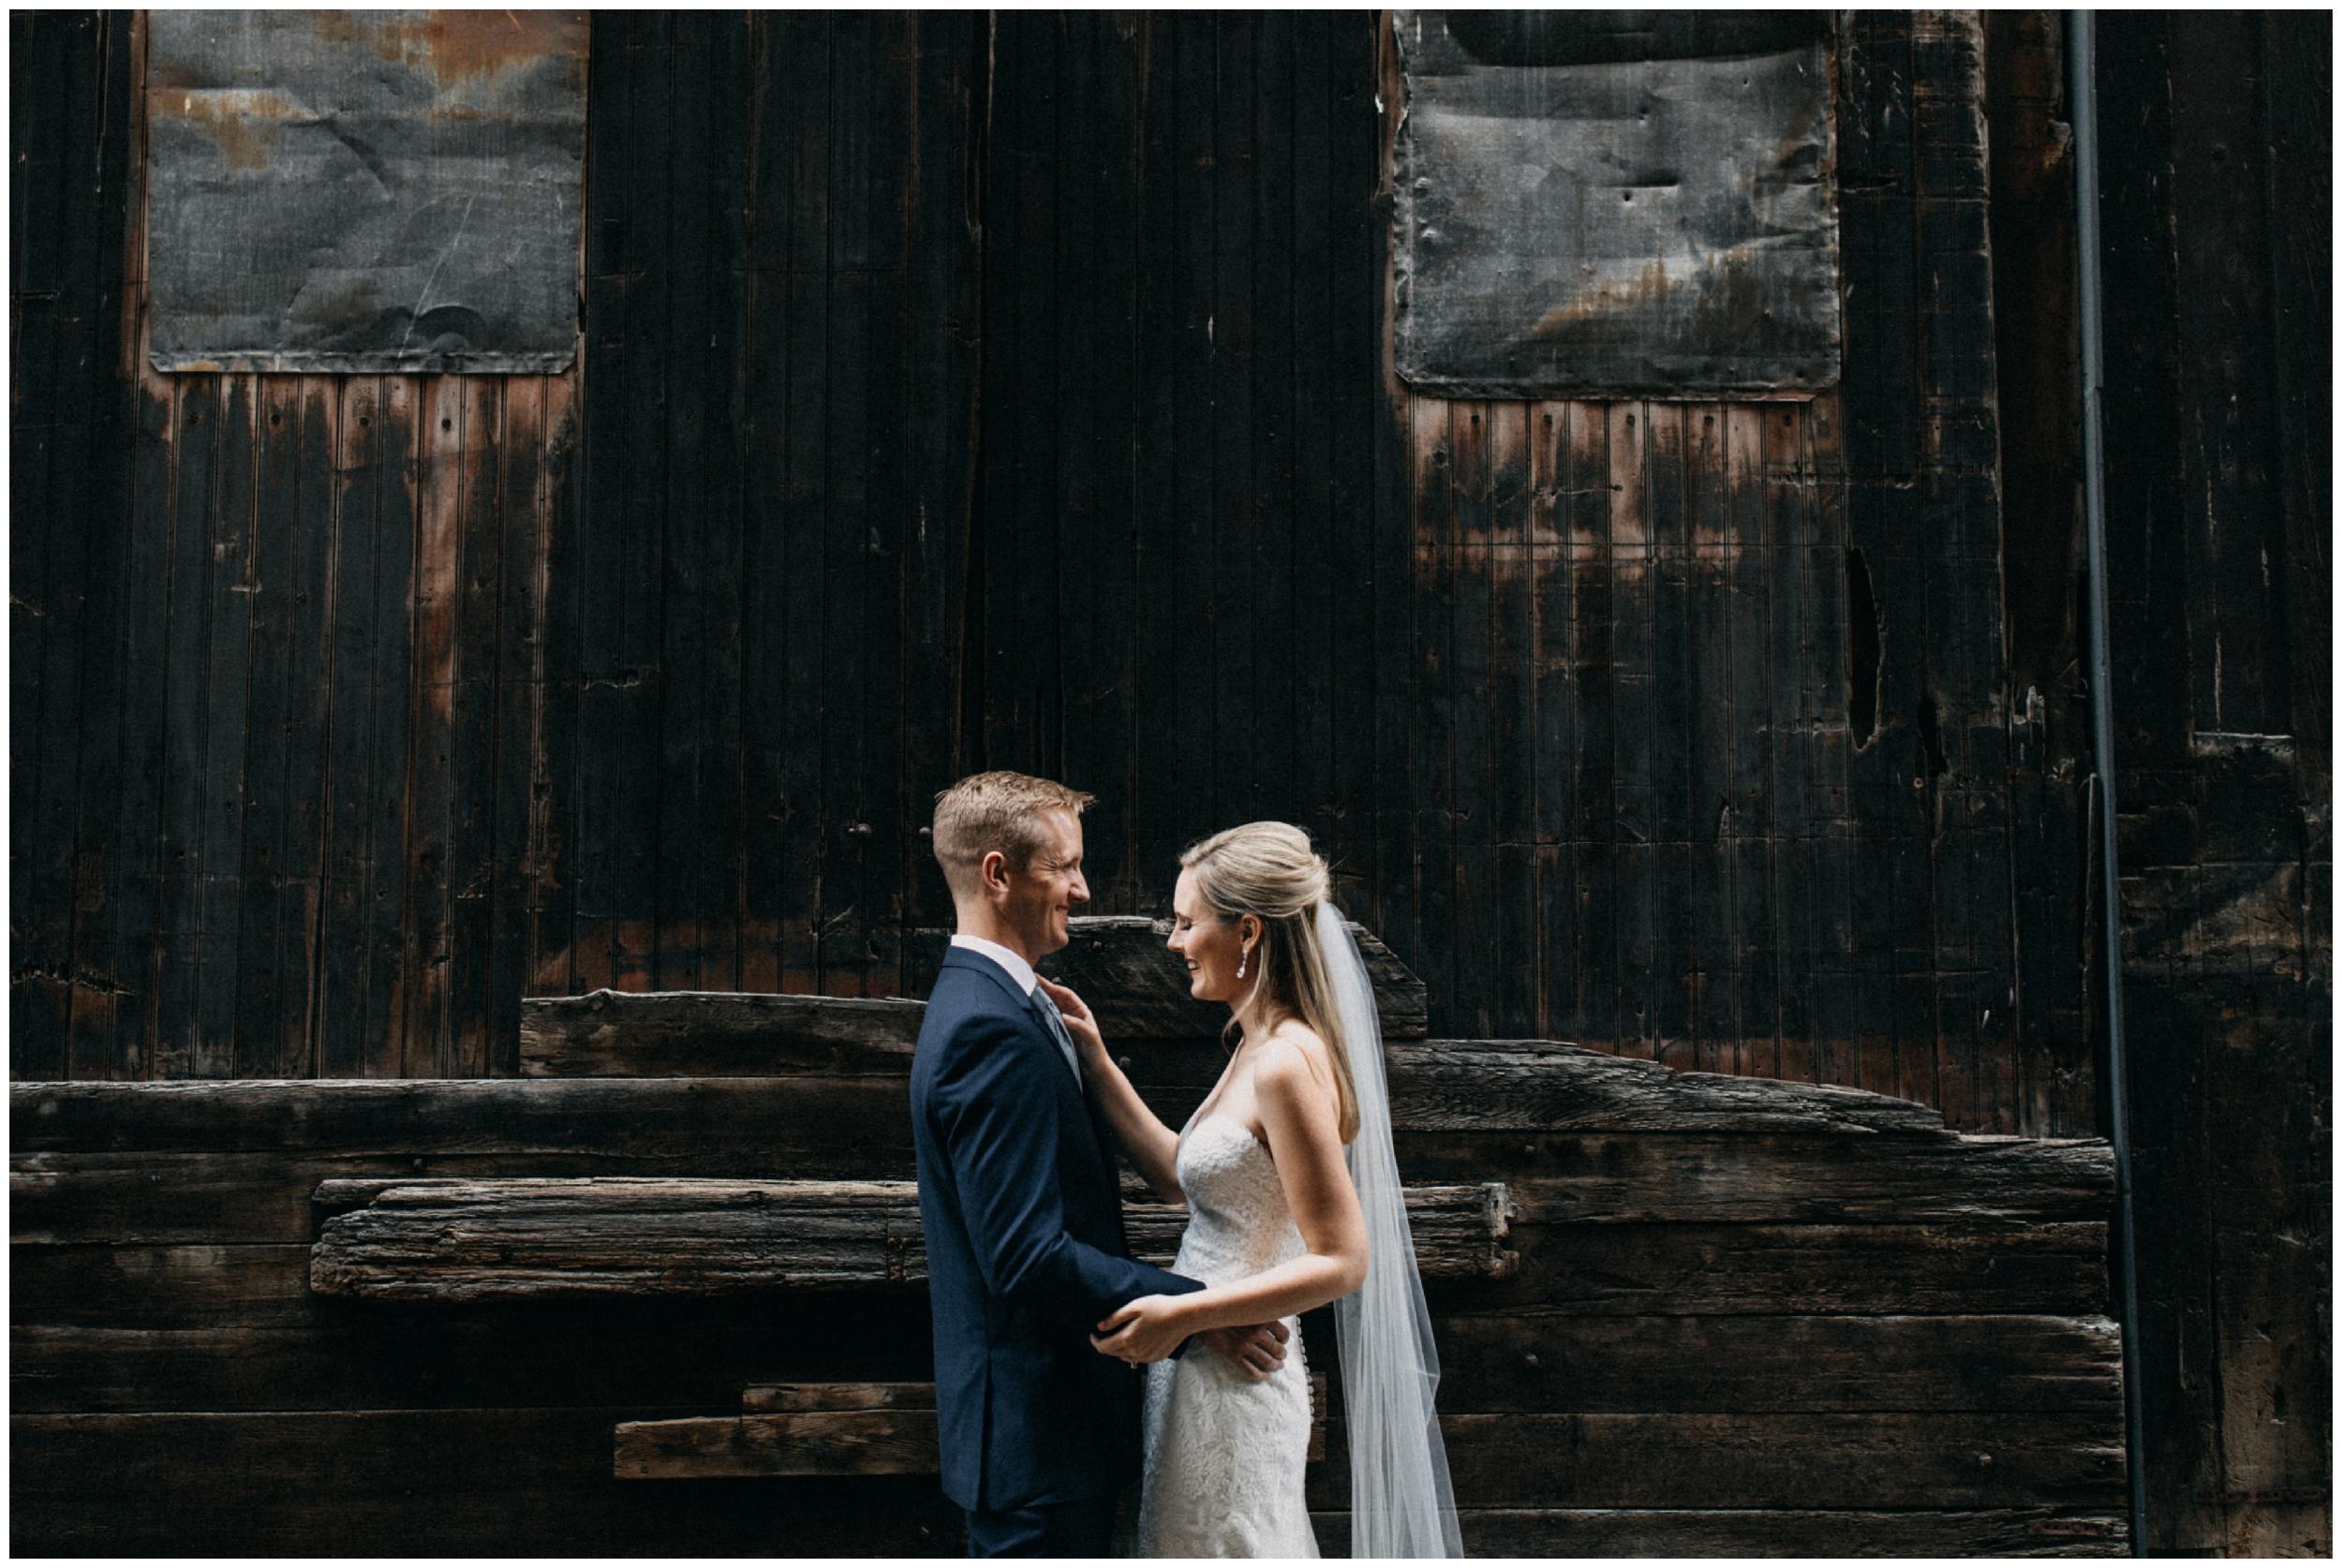 Minneapolis industrial wedding by Britt DeZeeuw